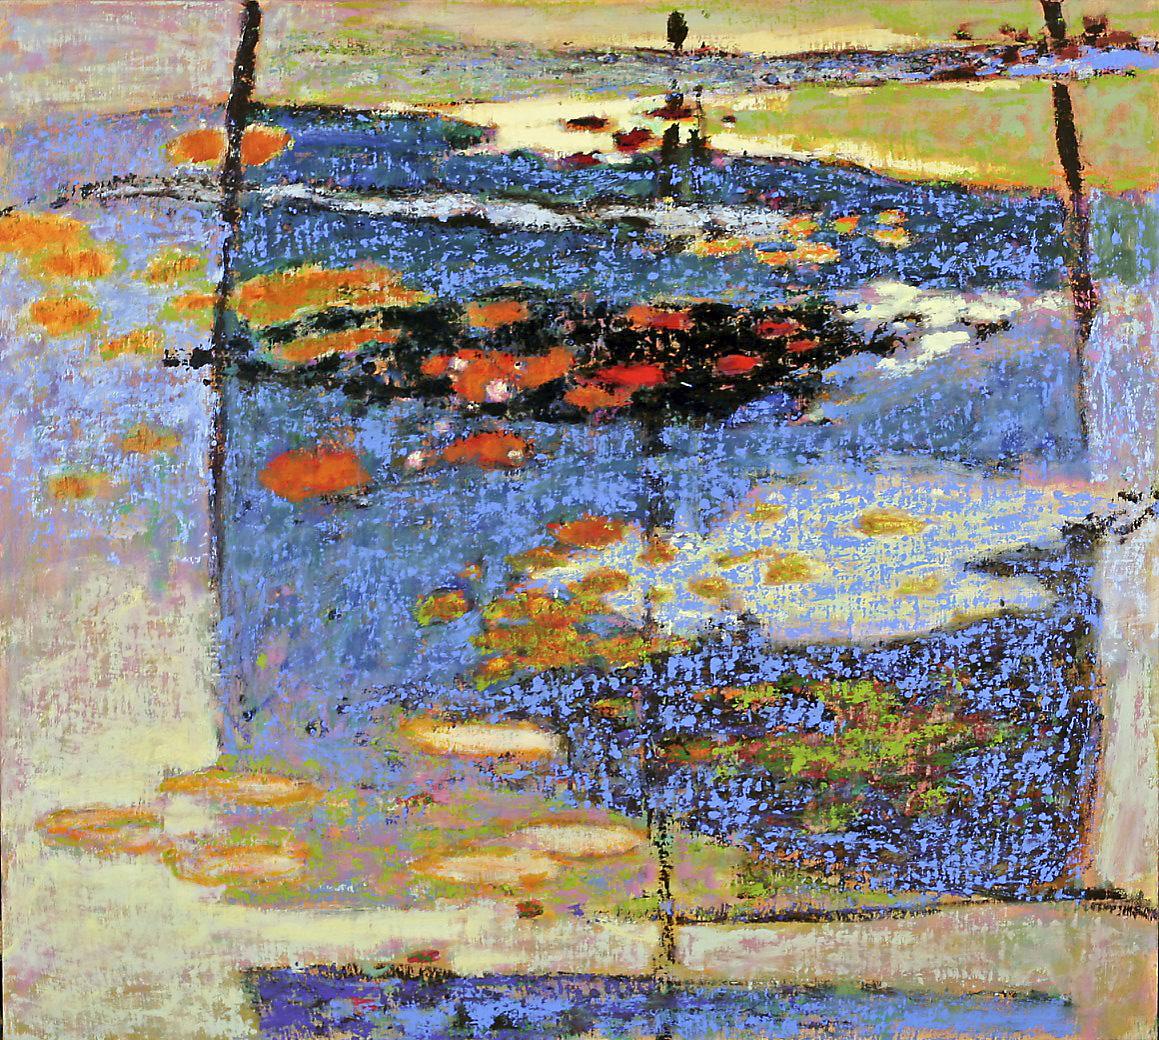 "Dream Passage   | oil on linen | 36 x 40"" | 2007"